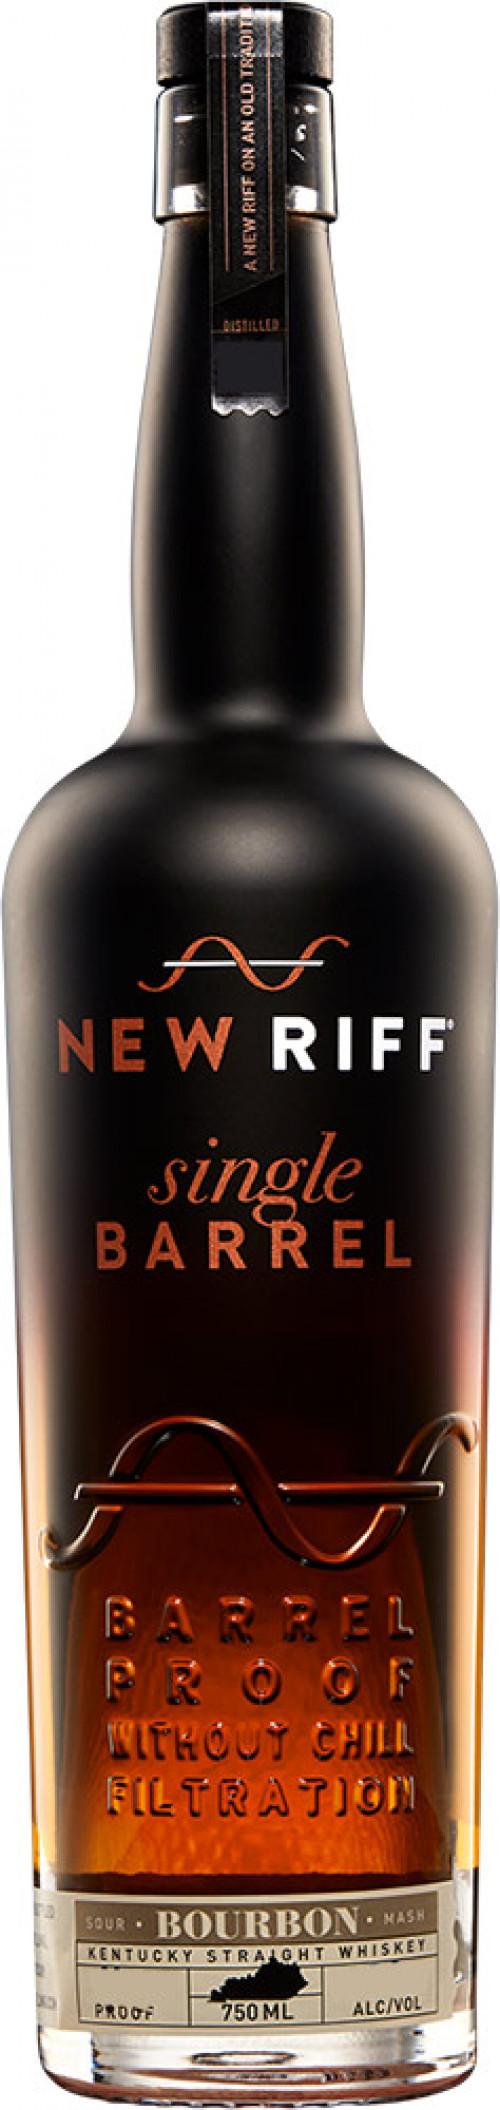 New Riff Single Barrel Bourbon 750ml